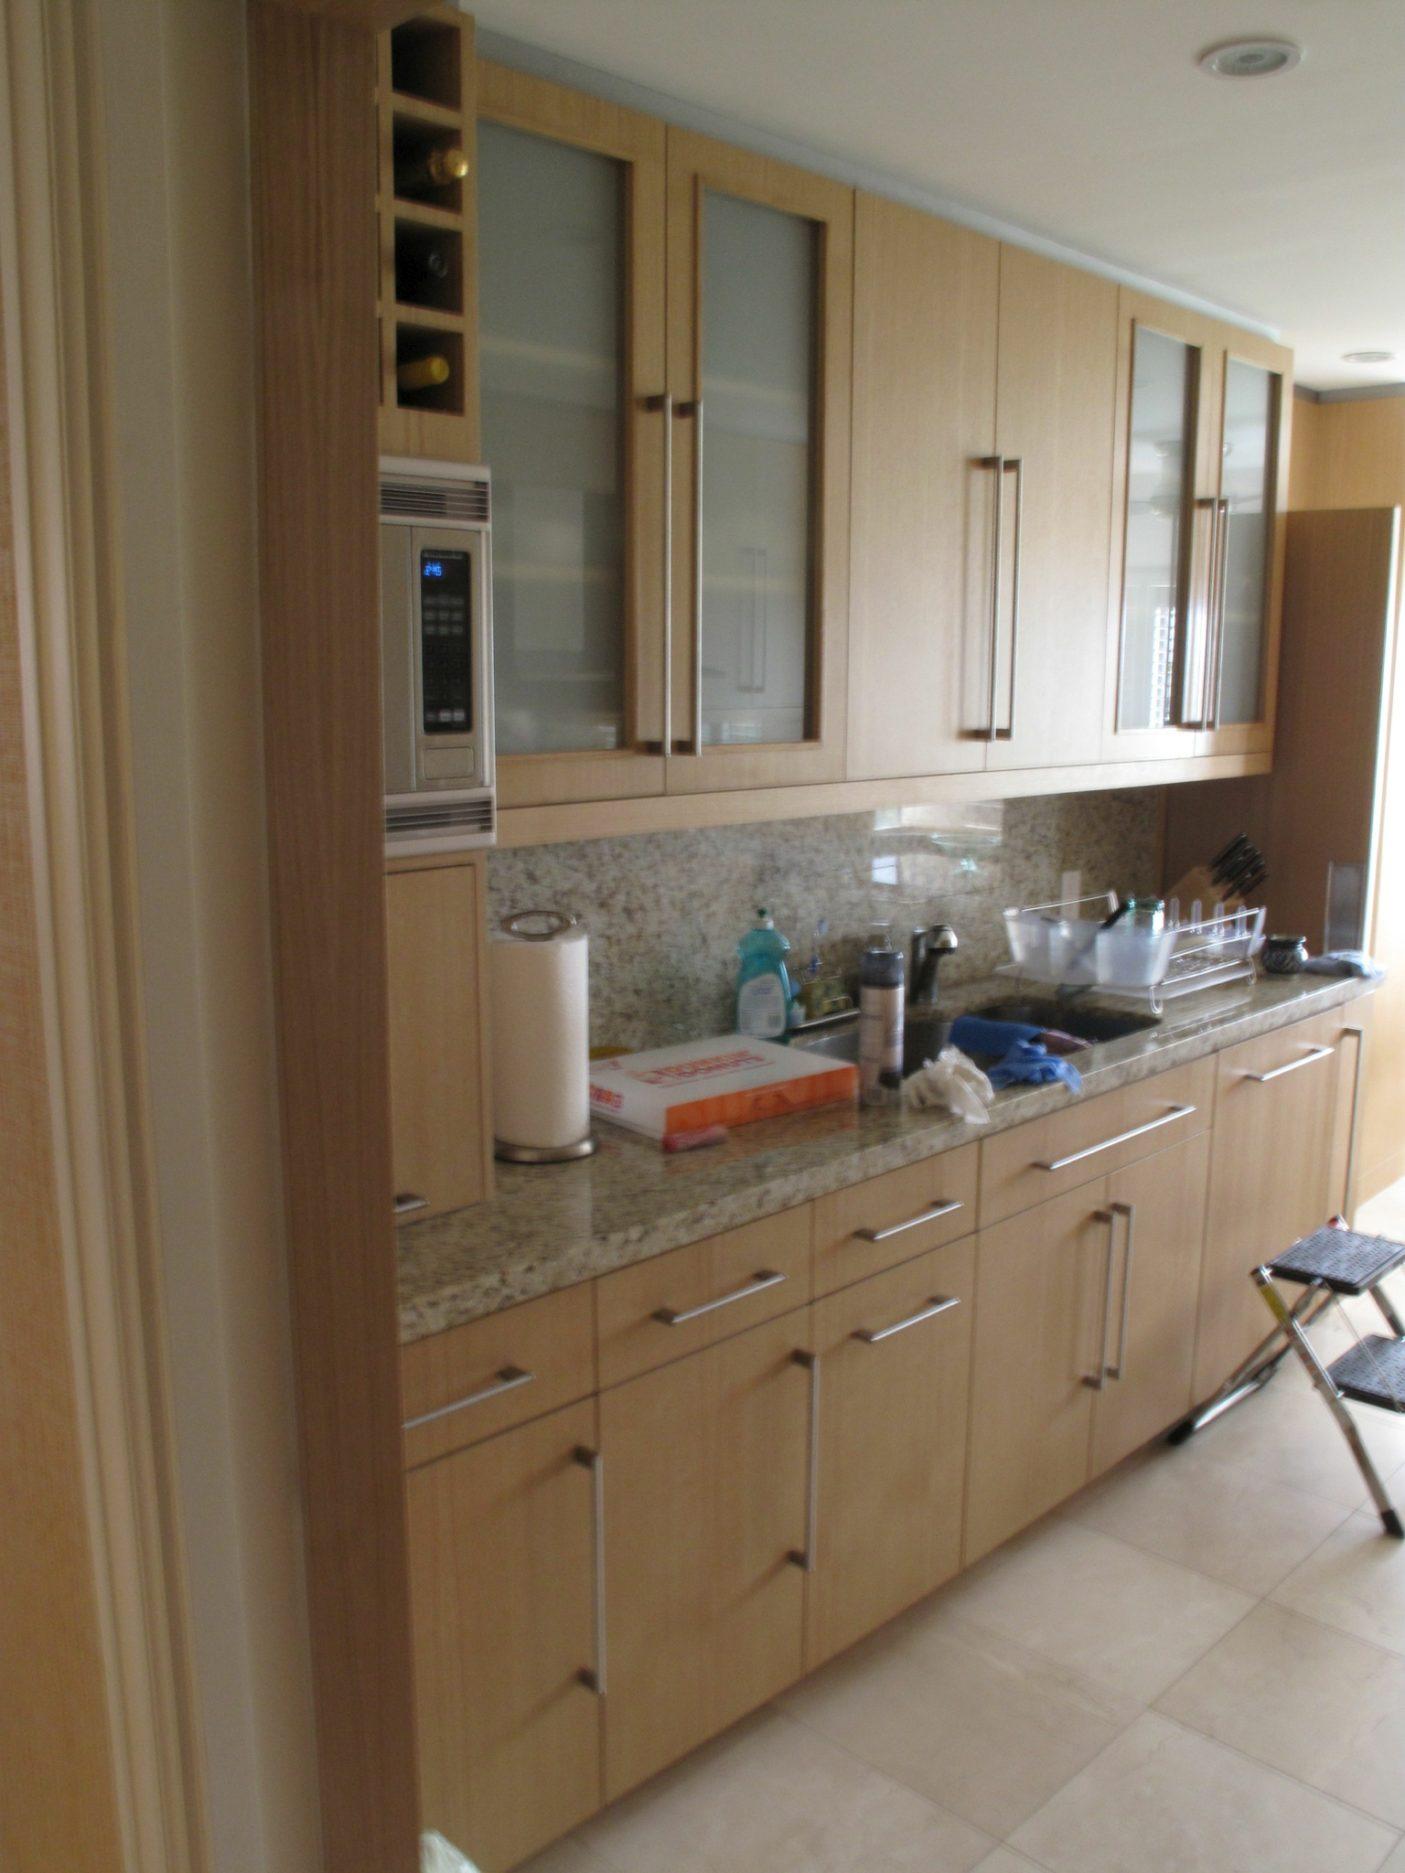 Kitchens-147.jpg